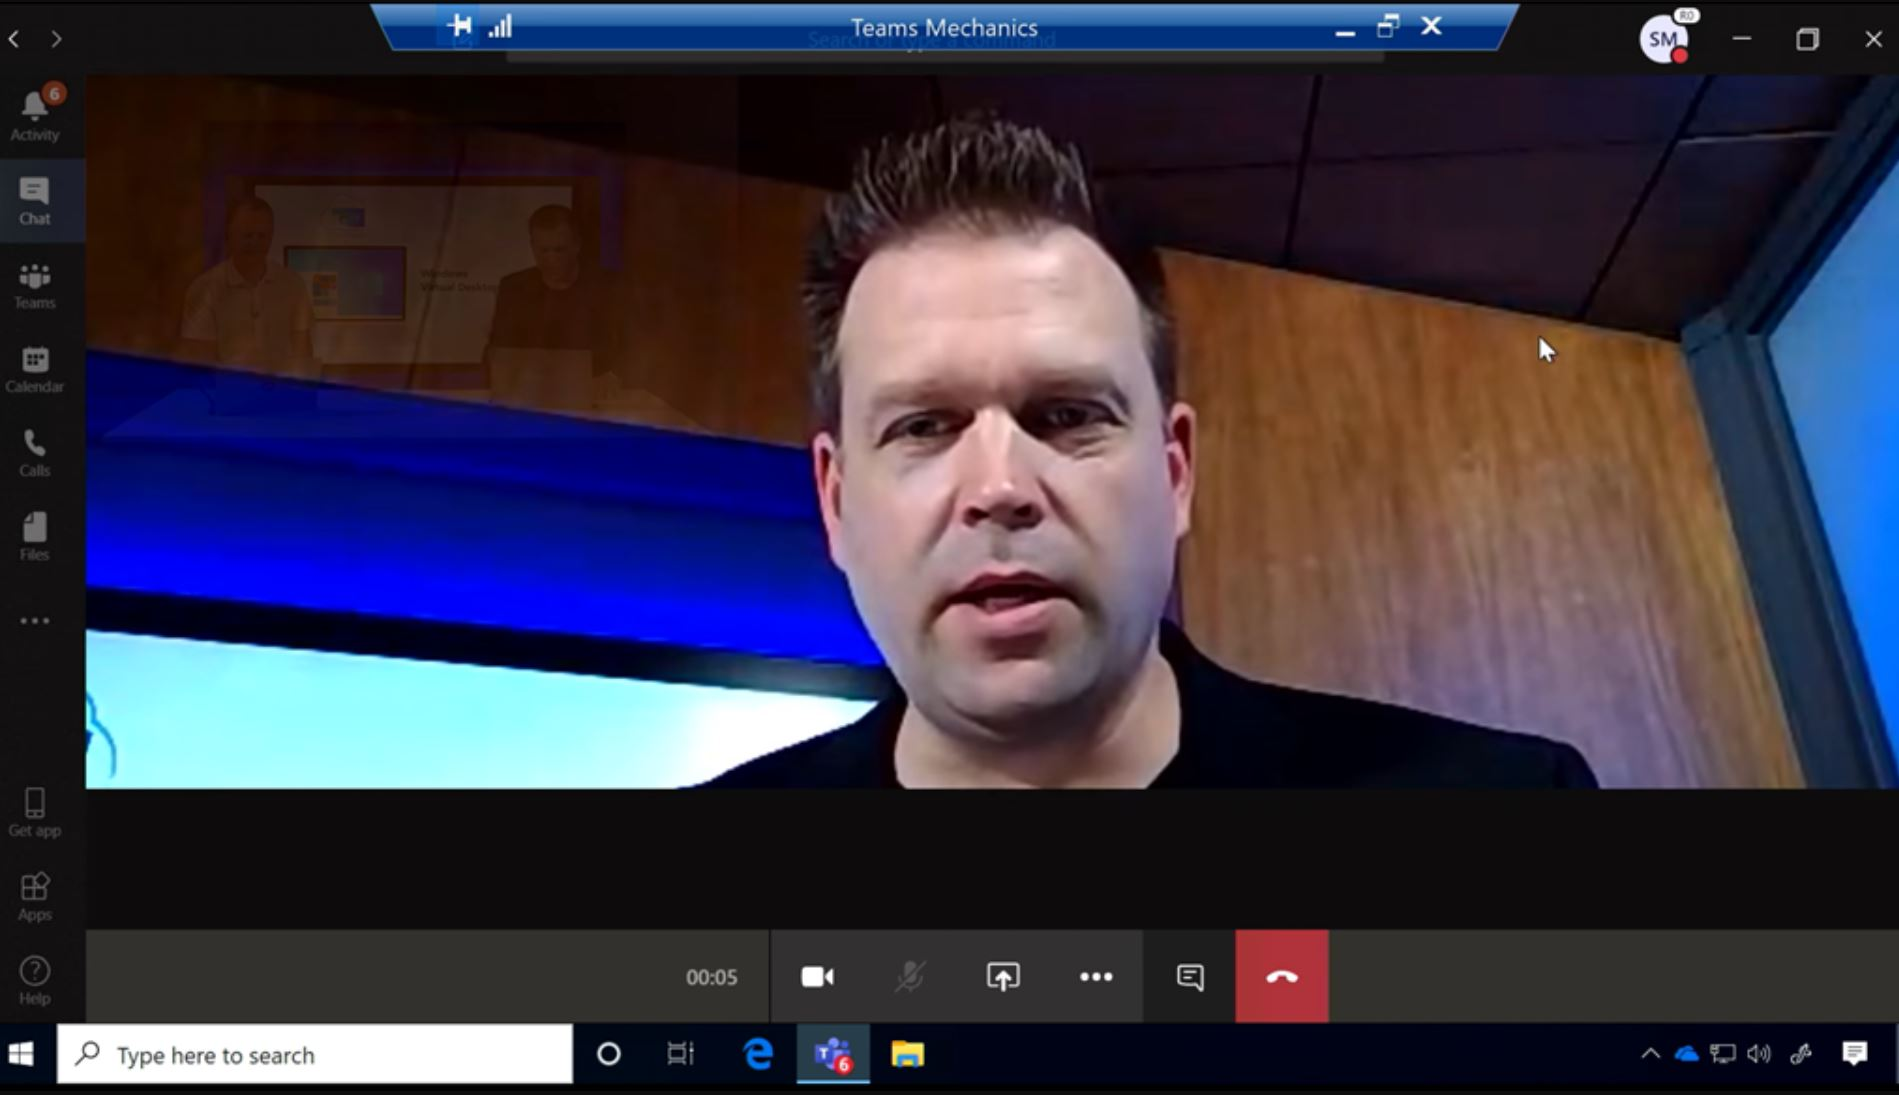 Microsoft Teams Windows Virtual Desktop